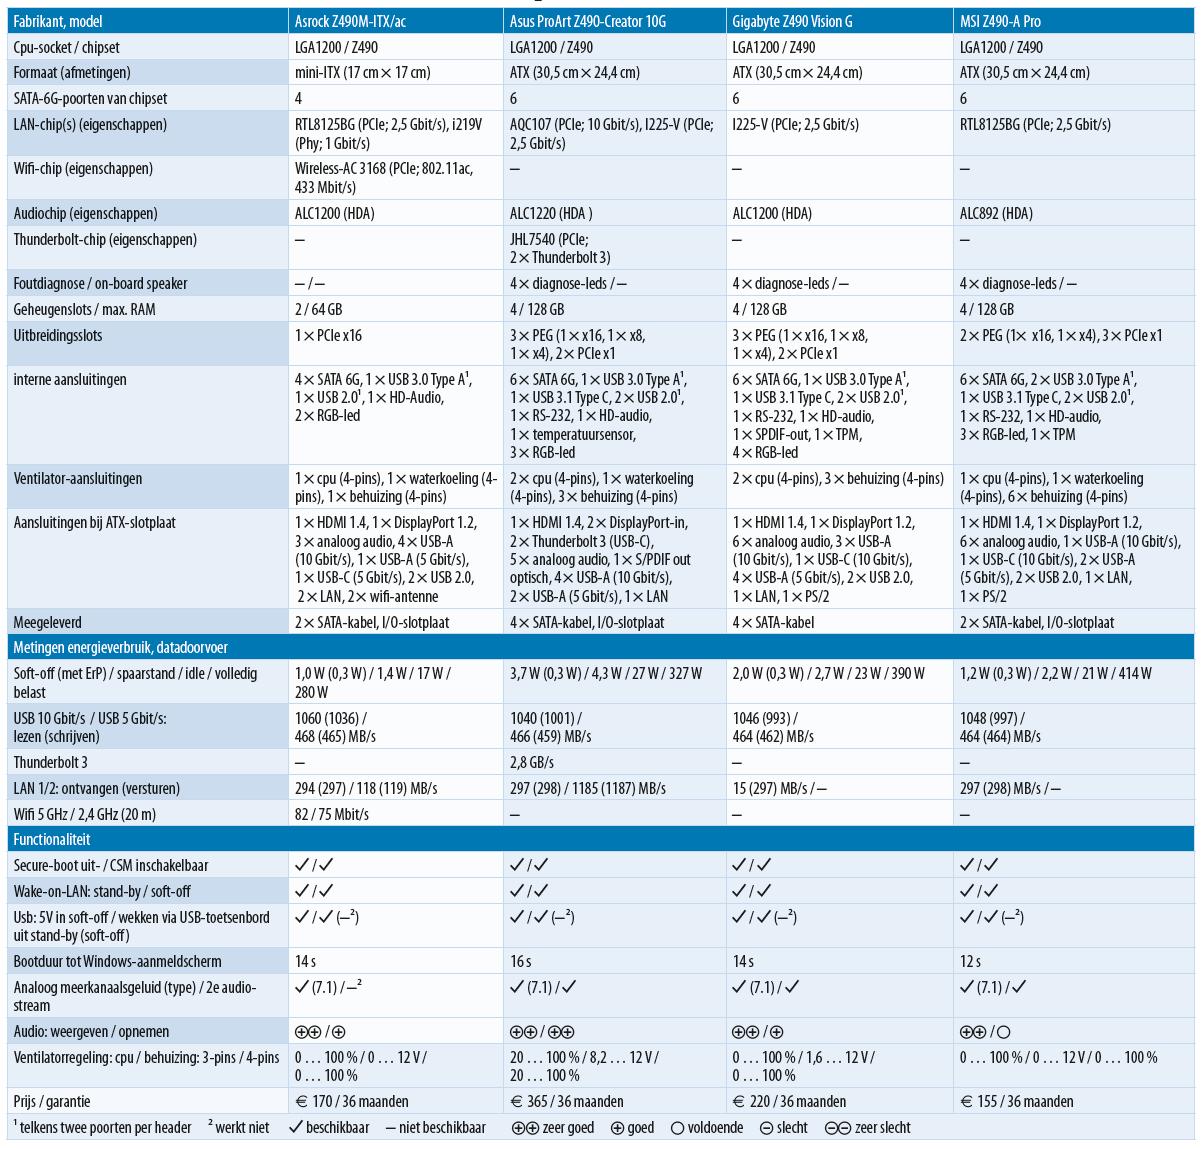 tabel Z490 moederbord test review LGA1200 vergelijking Intel Core-i.jpg